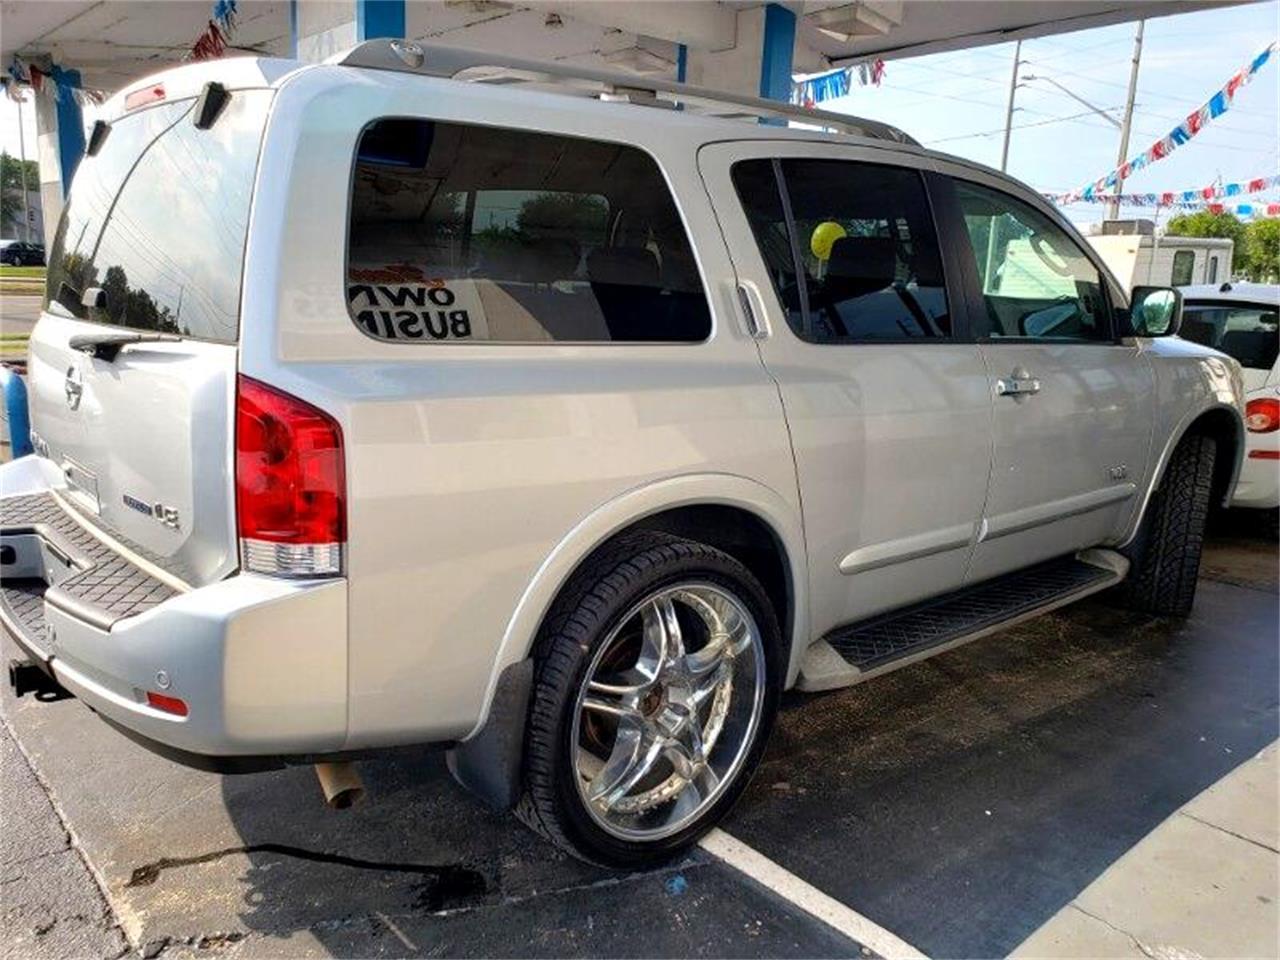 2009 Nissan Armada (CC-1262913) for sale in Tavares, Florida